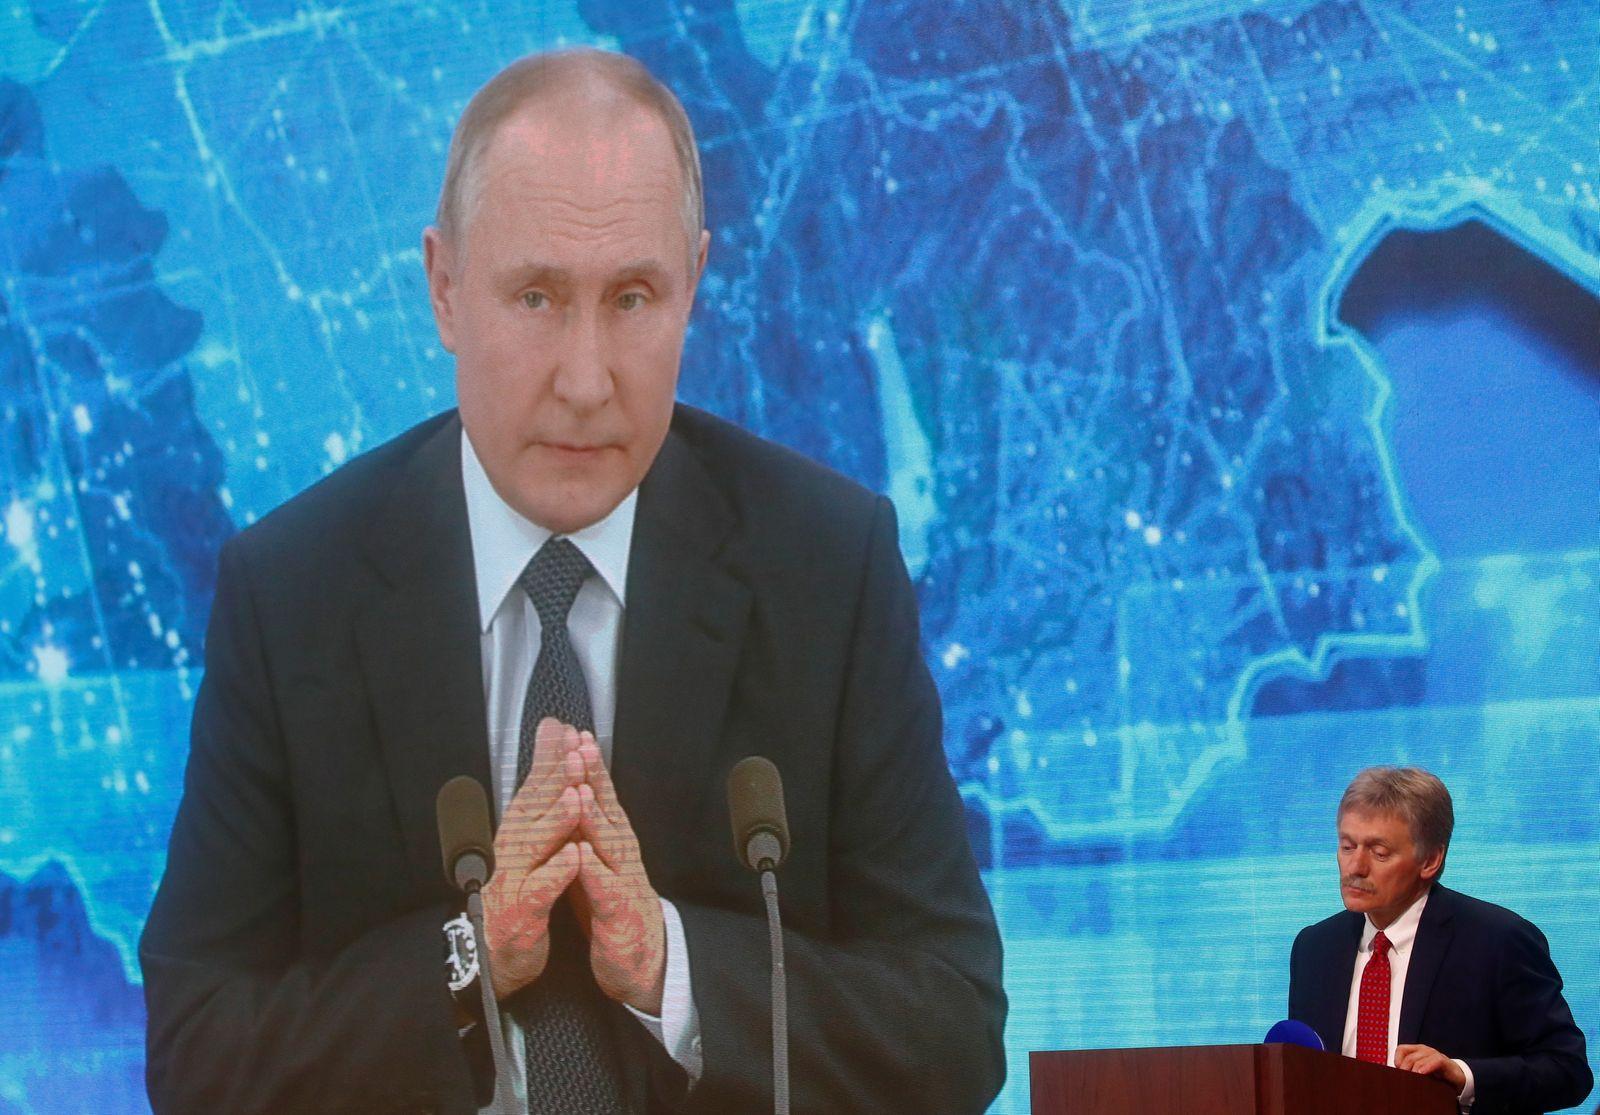 Kremlin spokesman Dmitry Peskov attends President Vladimir Putin's annual end-of-year news conference in Moscow